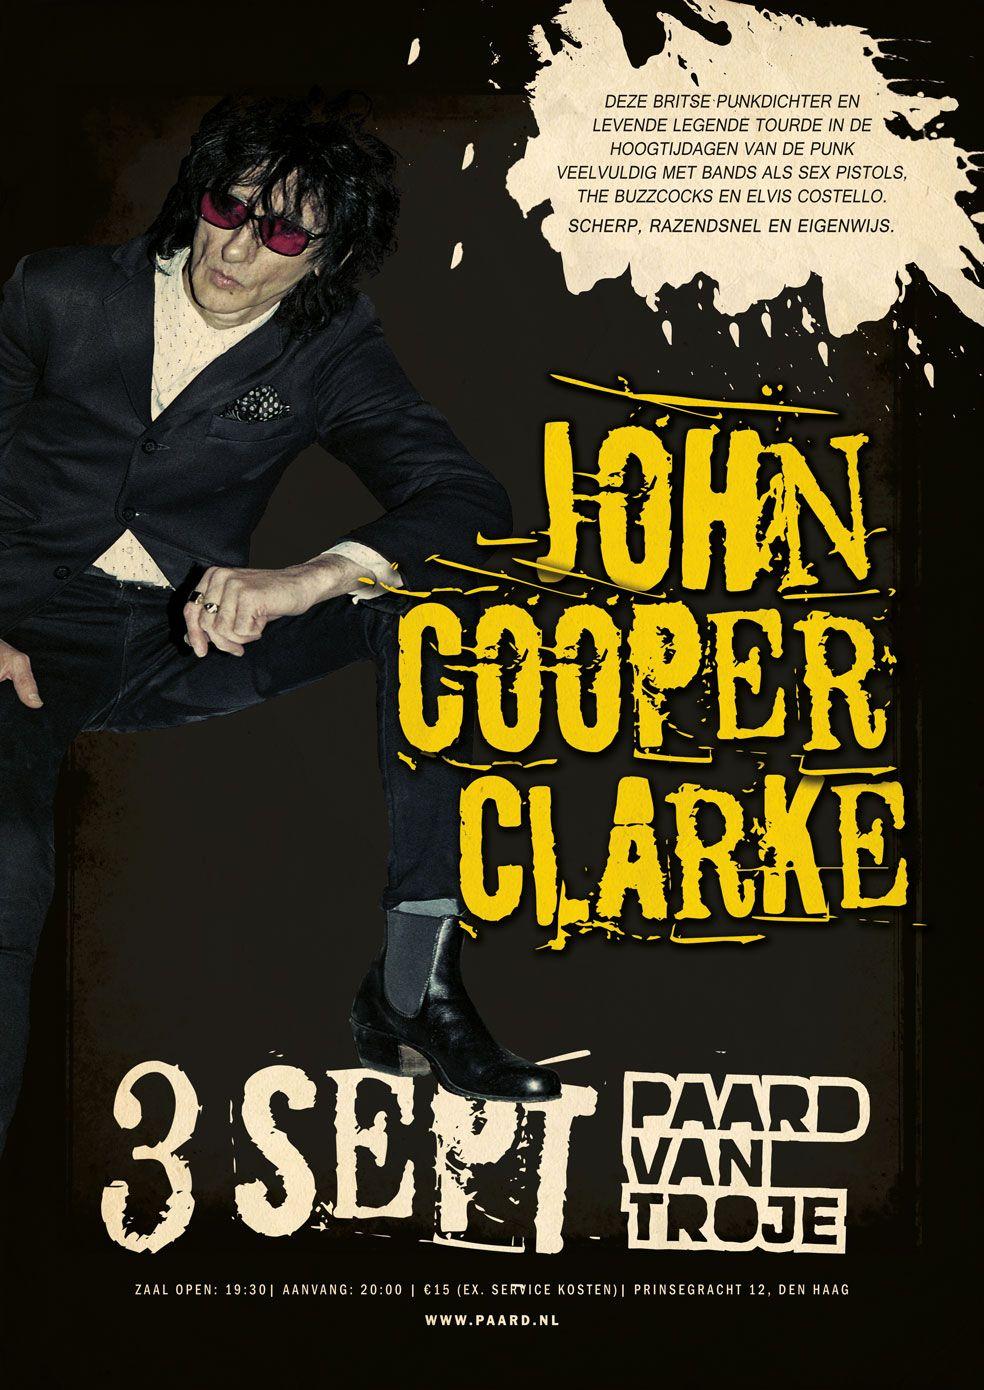 Donderdag 3 september. http://www.paard.nl/event/4183/JOHN-COOPER-CLARK